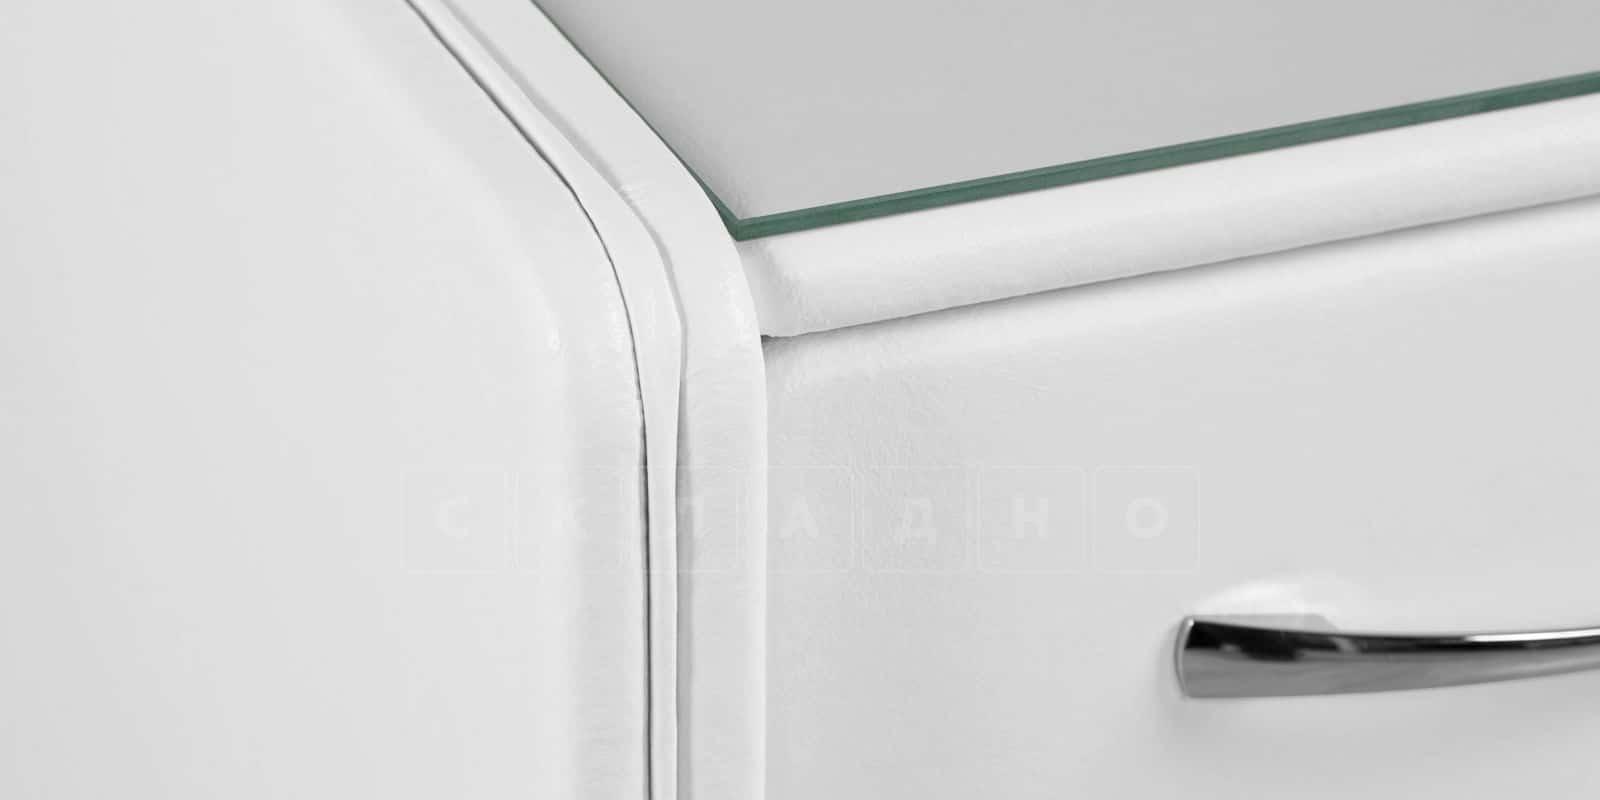 Прикроватная тумба Малибу 3 ящика фото 5   интернет-магазин Складно